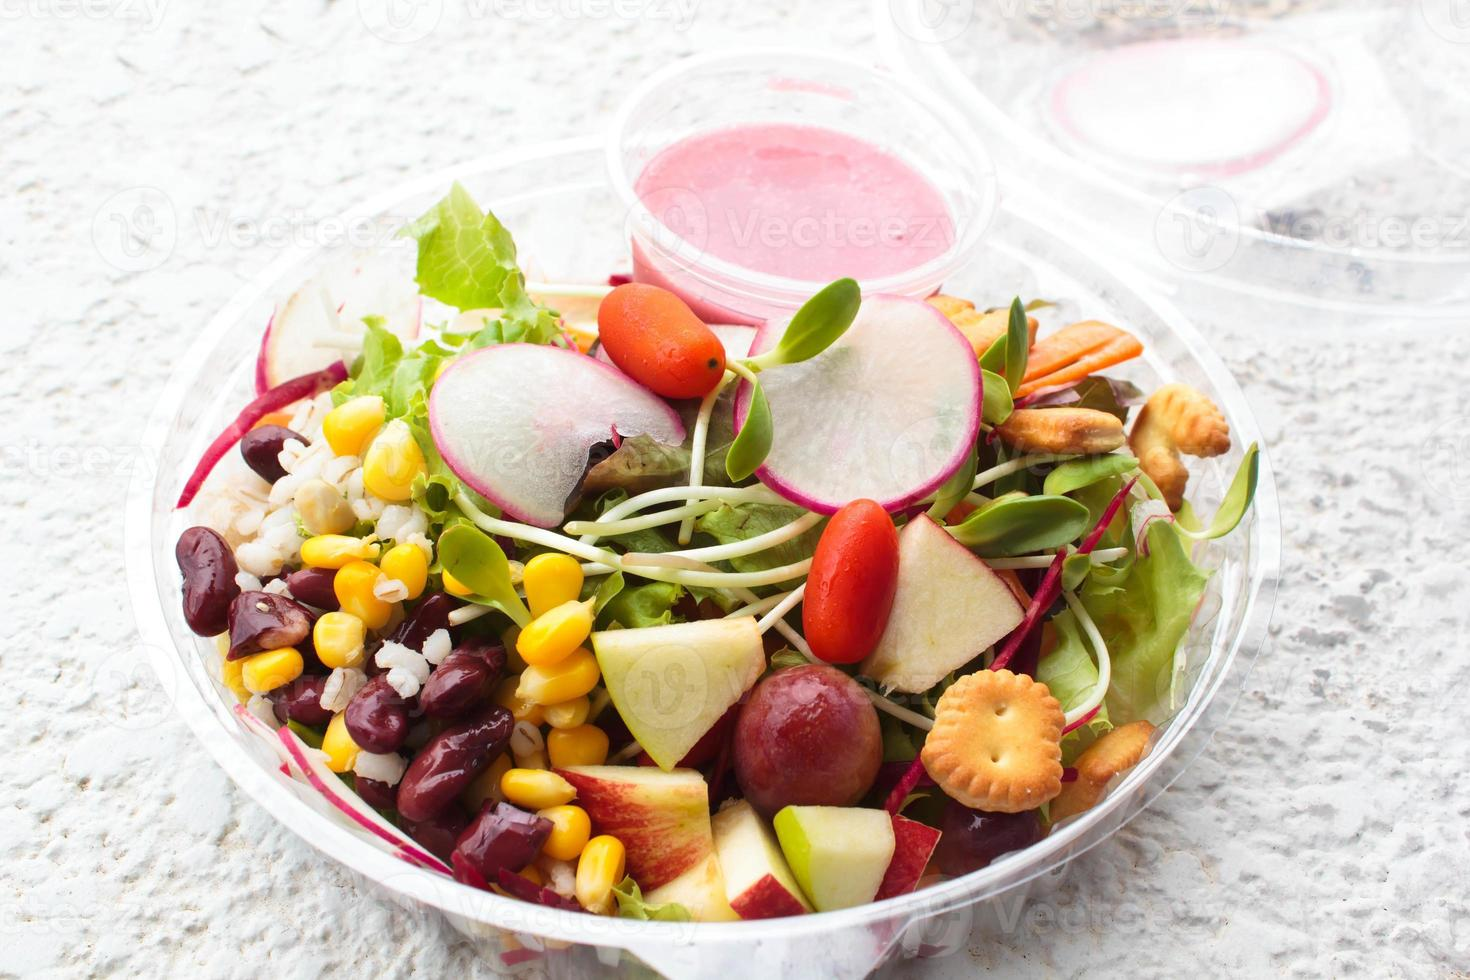 verse salade groente en fruit. foto